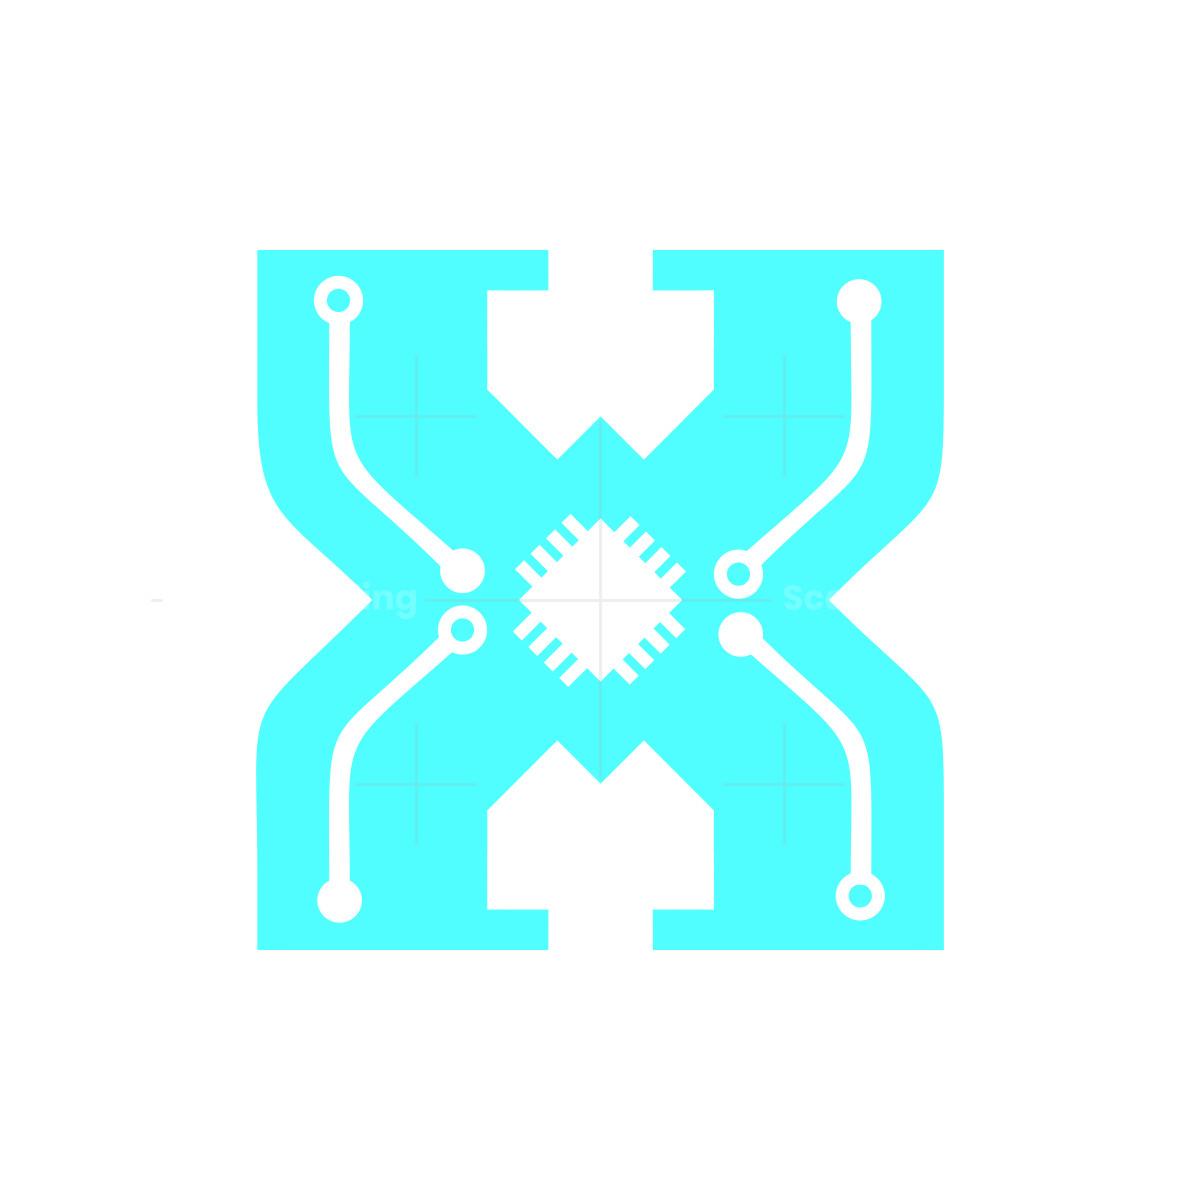 initial h tech letter logo